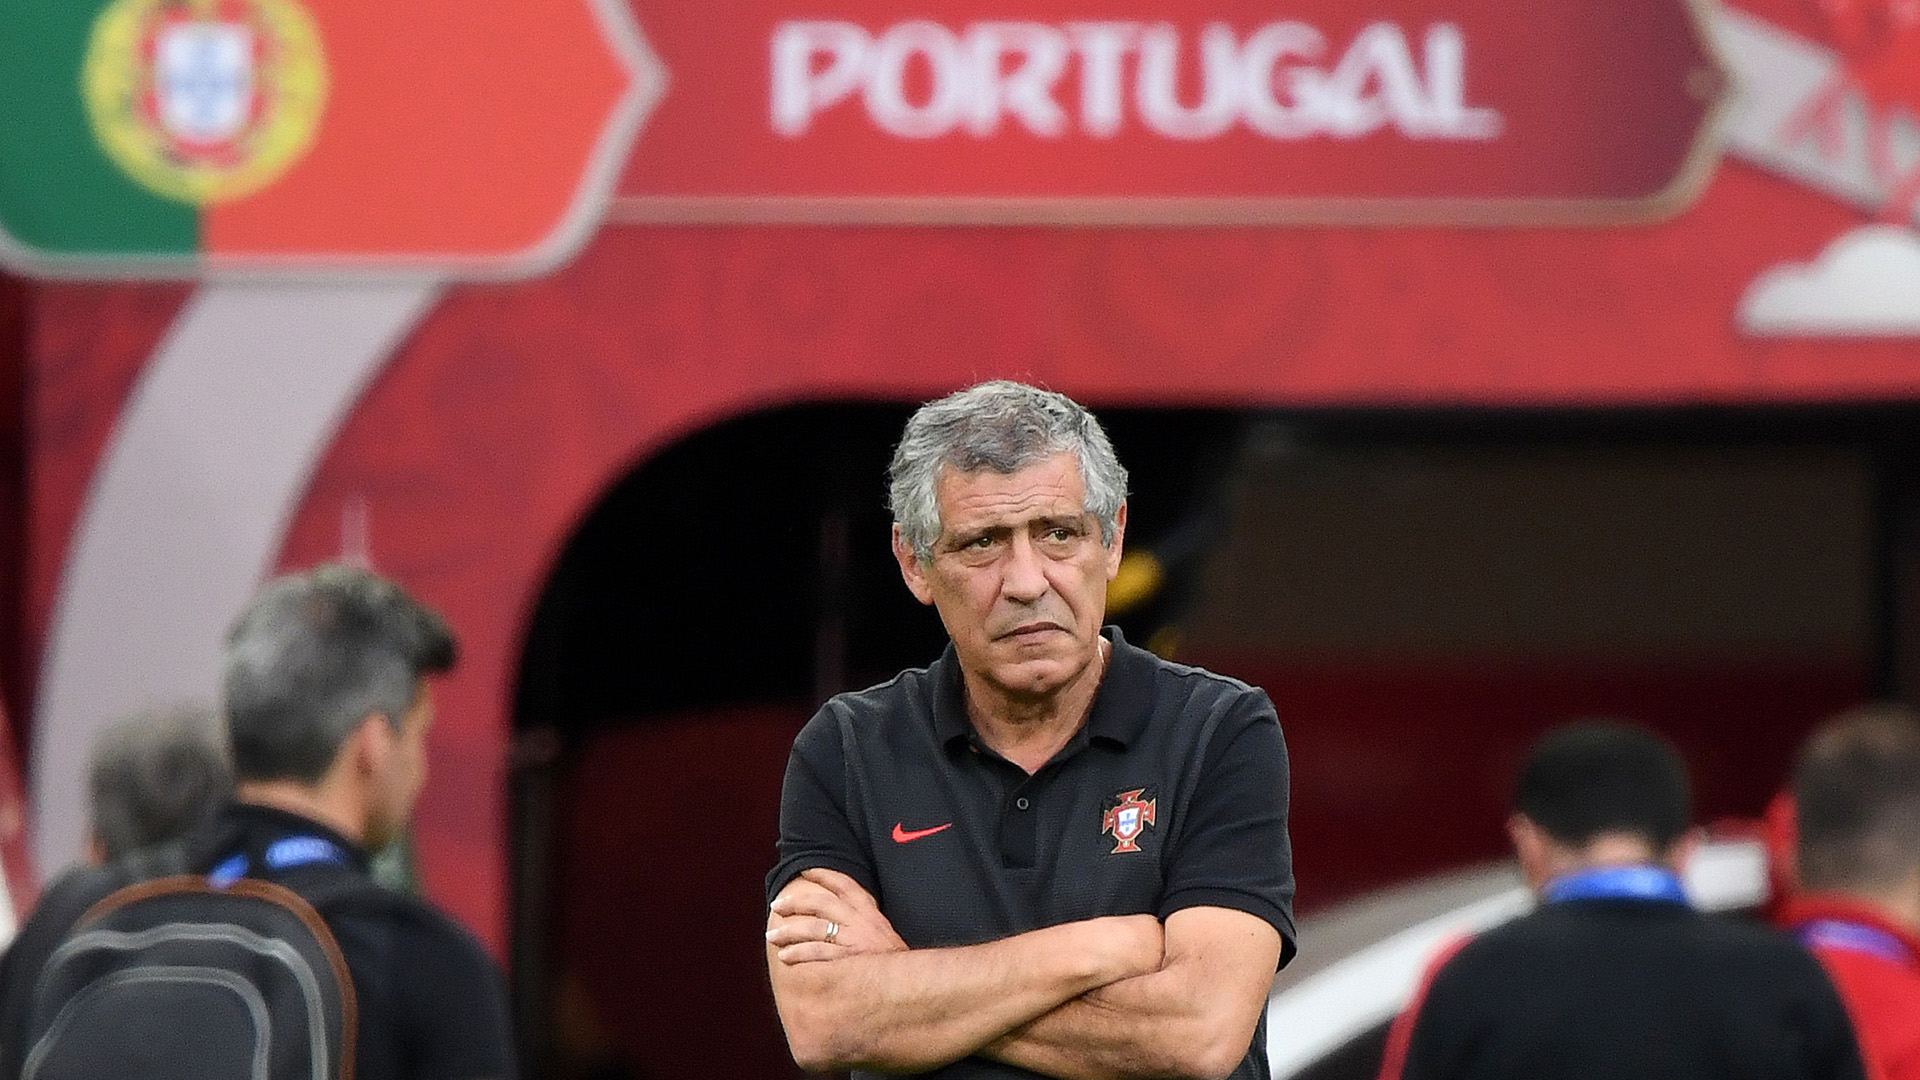 fernando santos portugal confed cup 2017